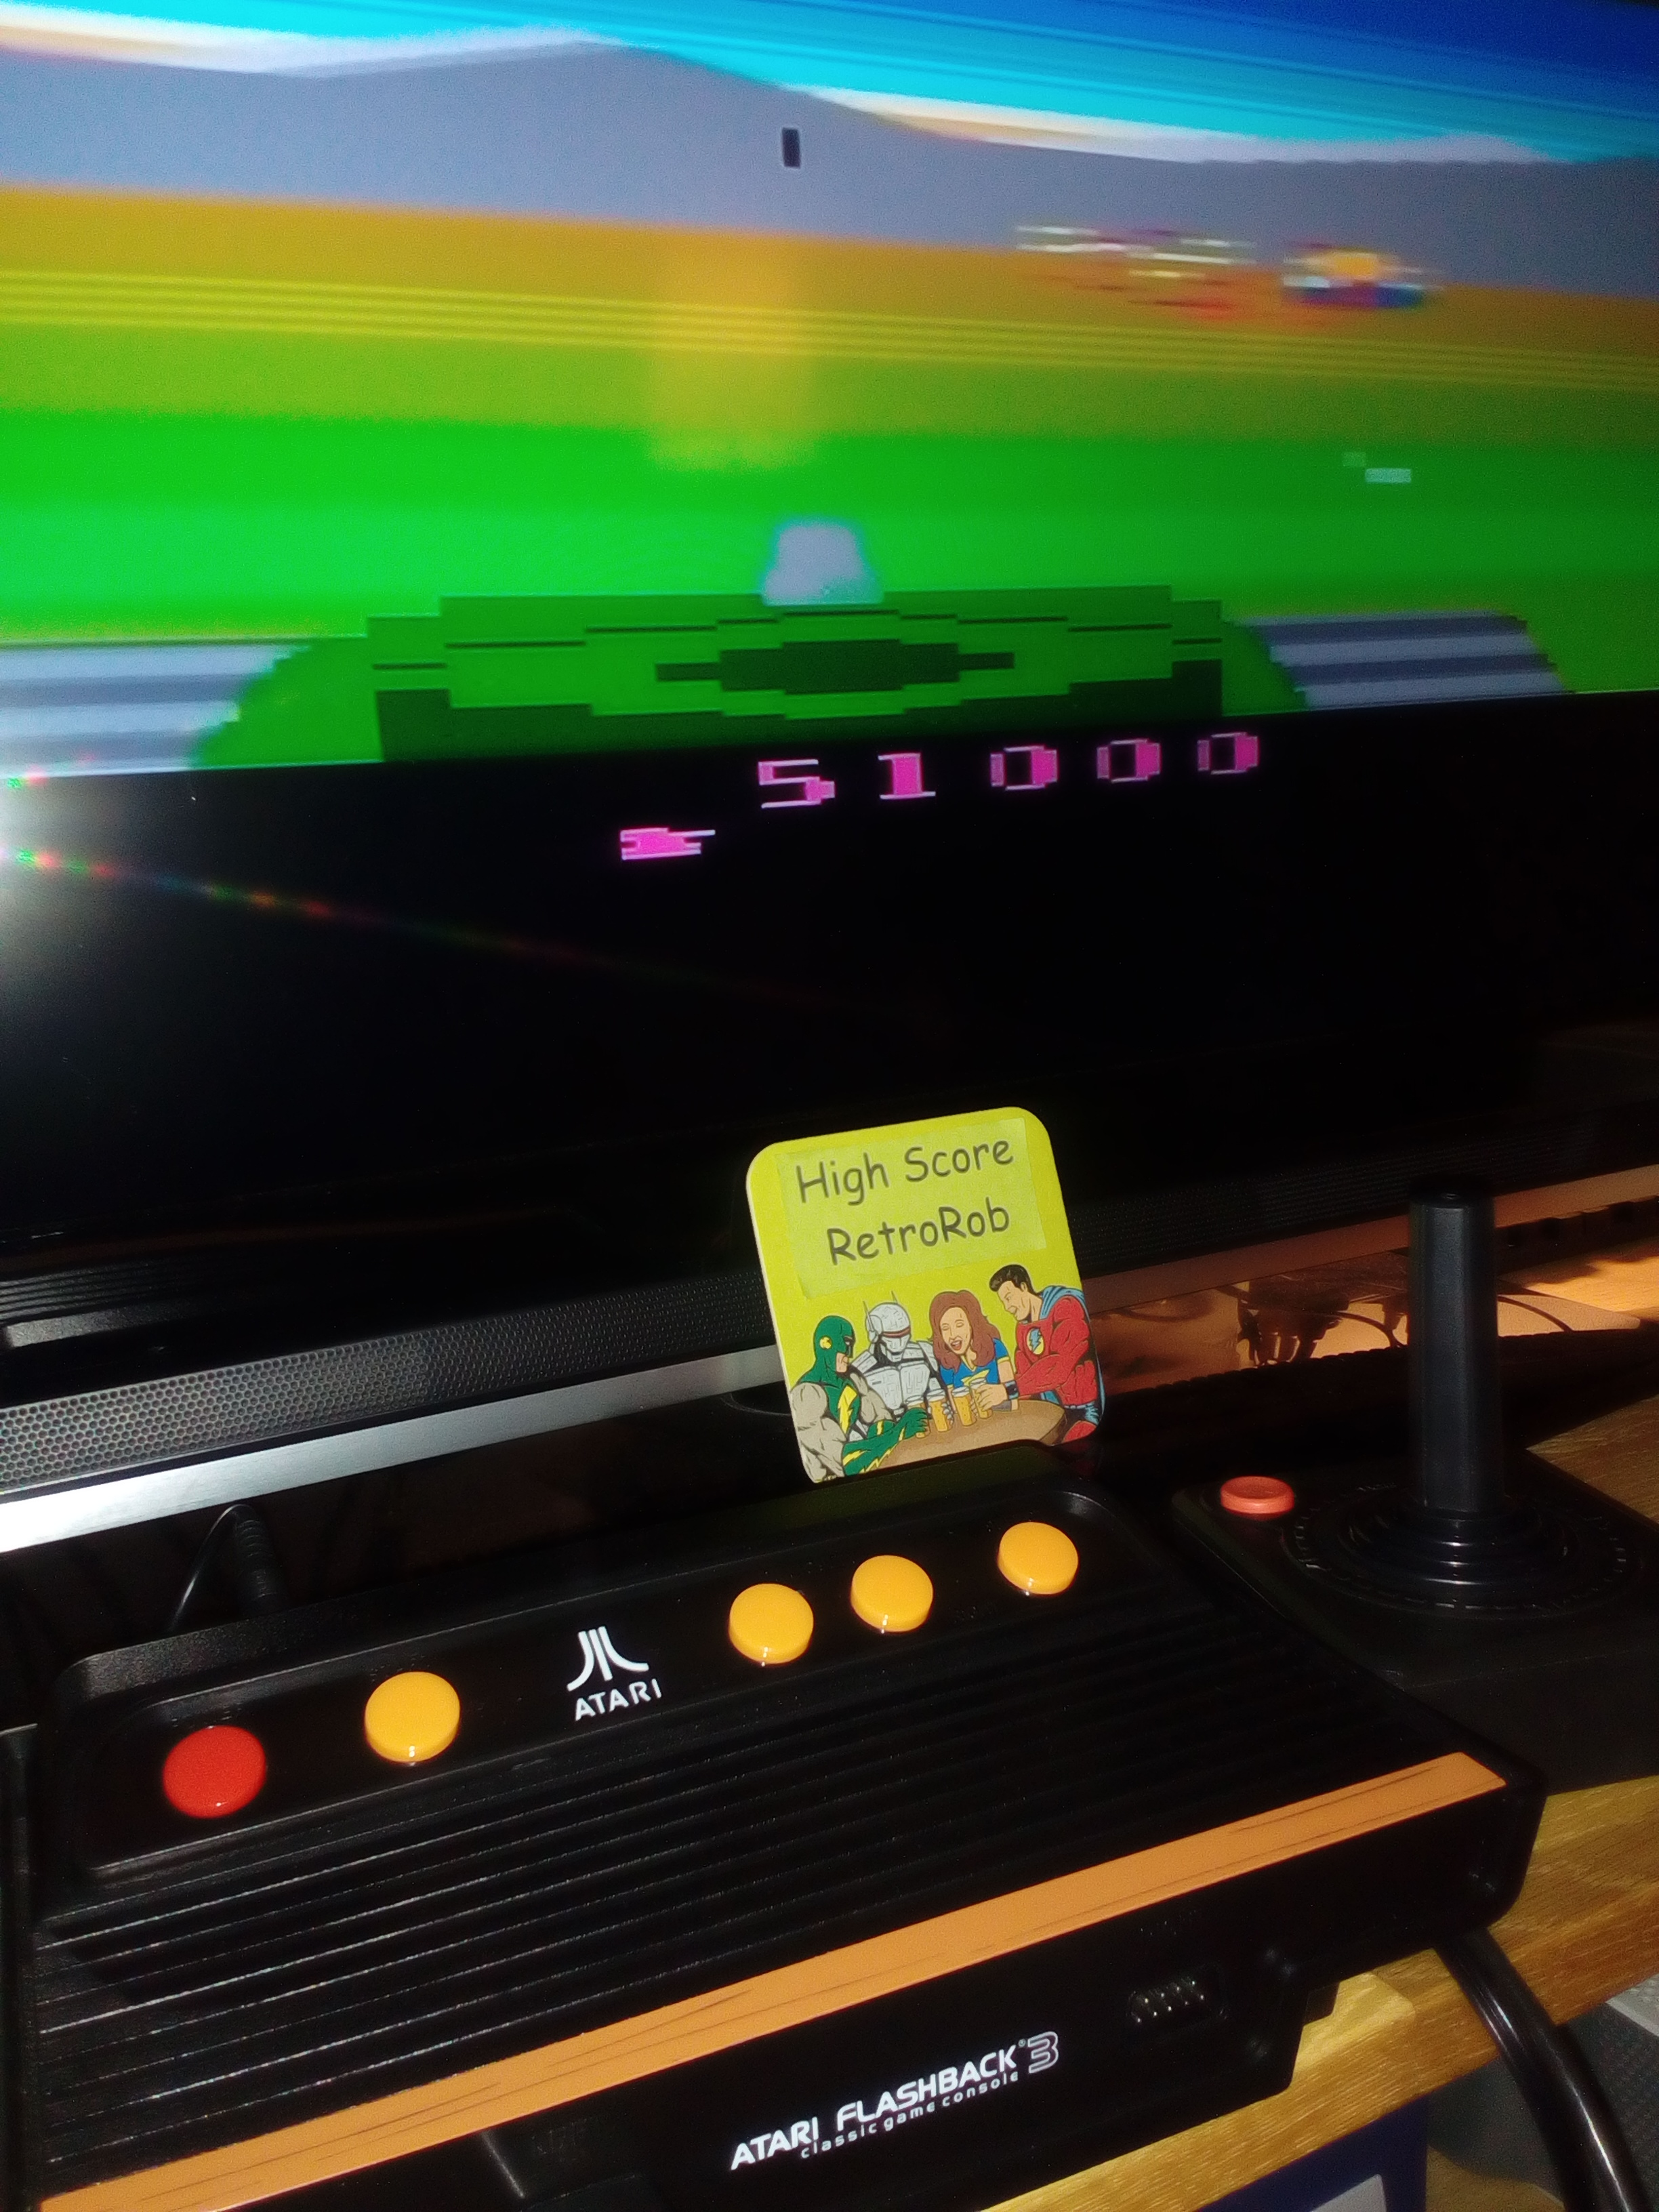 RetroRob: Battlezone (Atari Flashback 3) 51,000 points on 2018-08-29 15:57:00